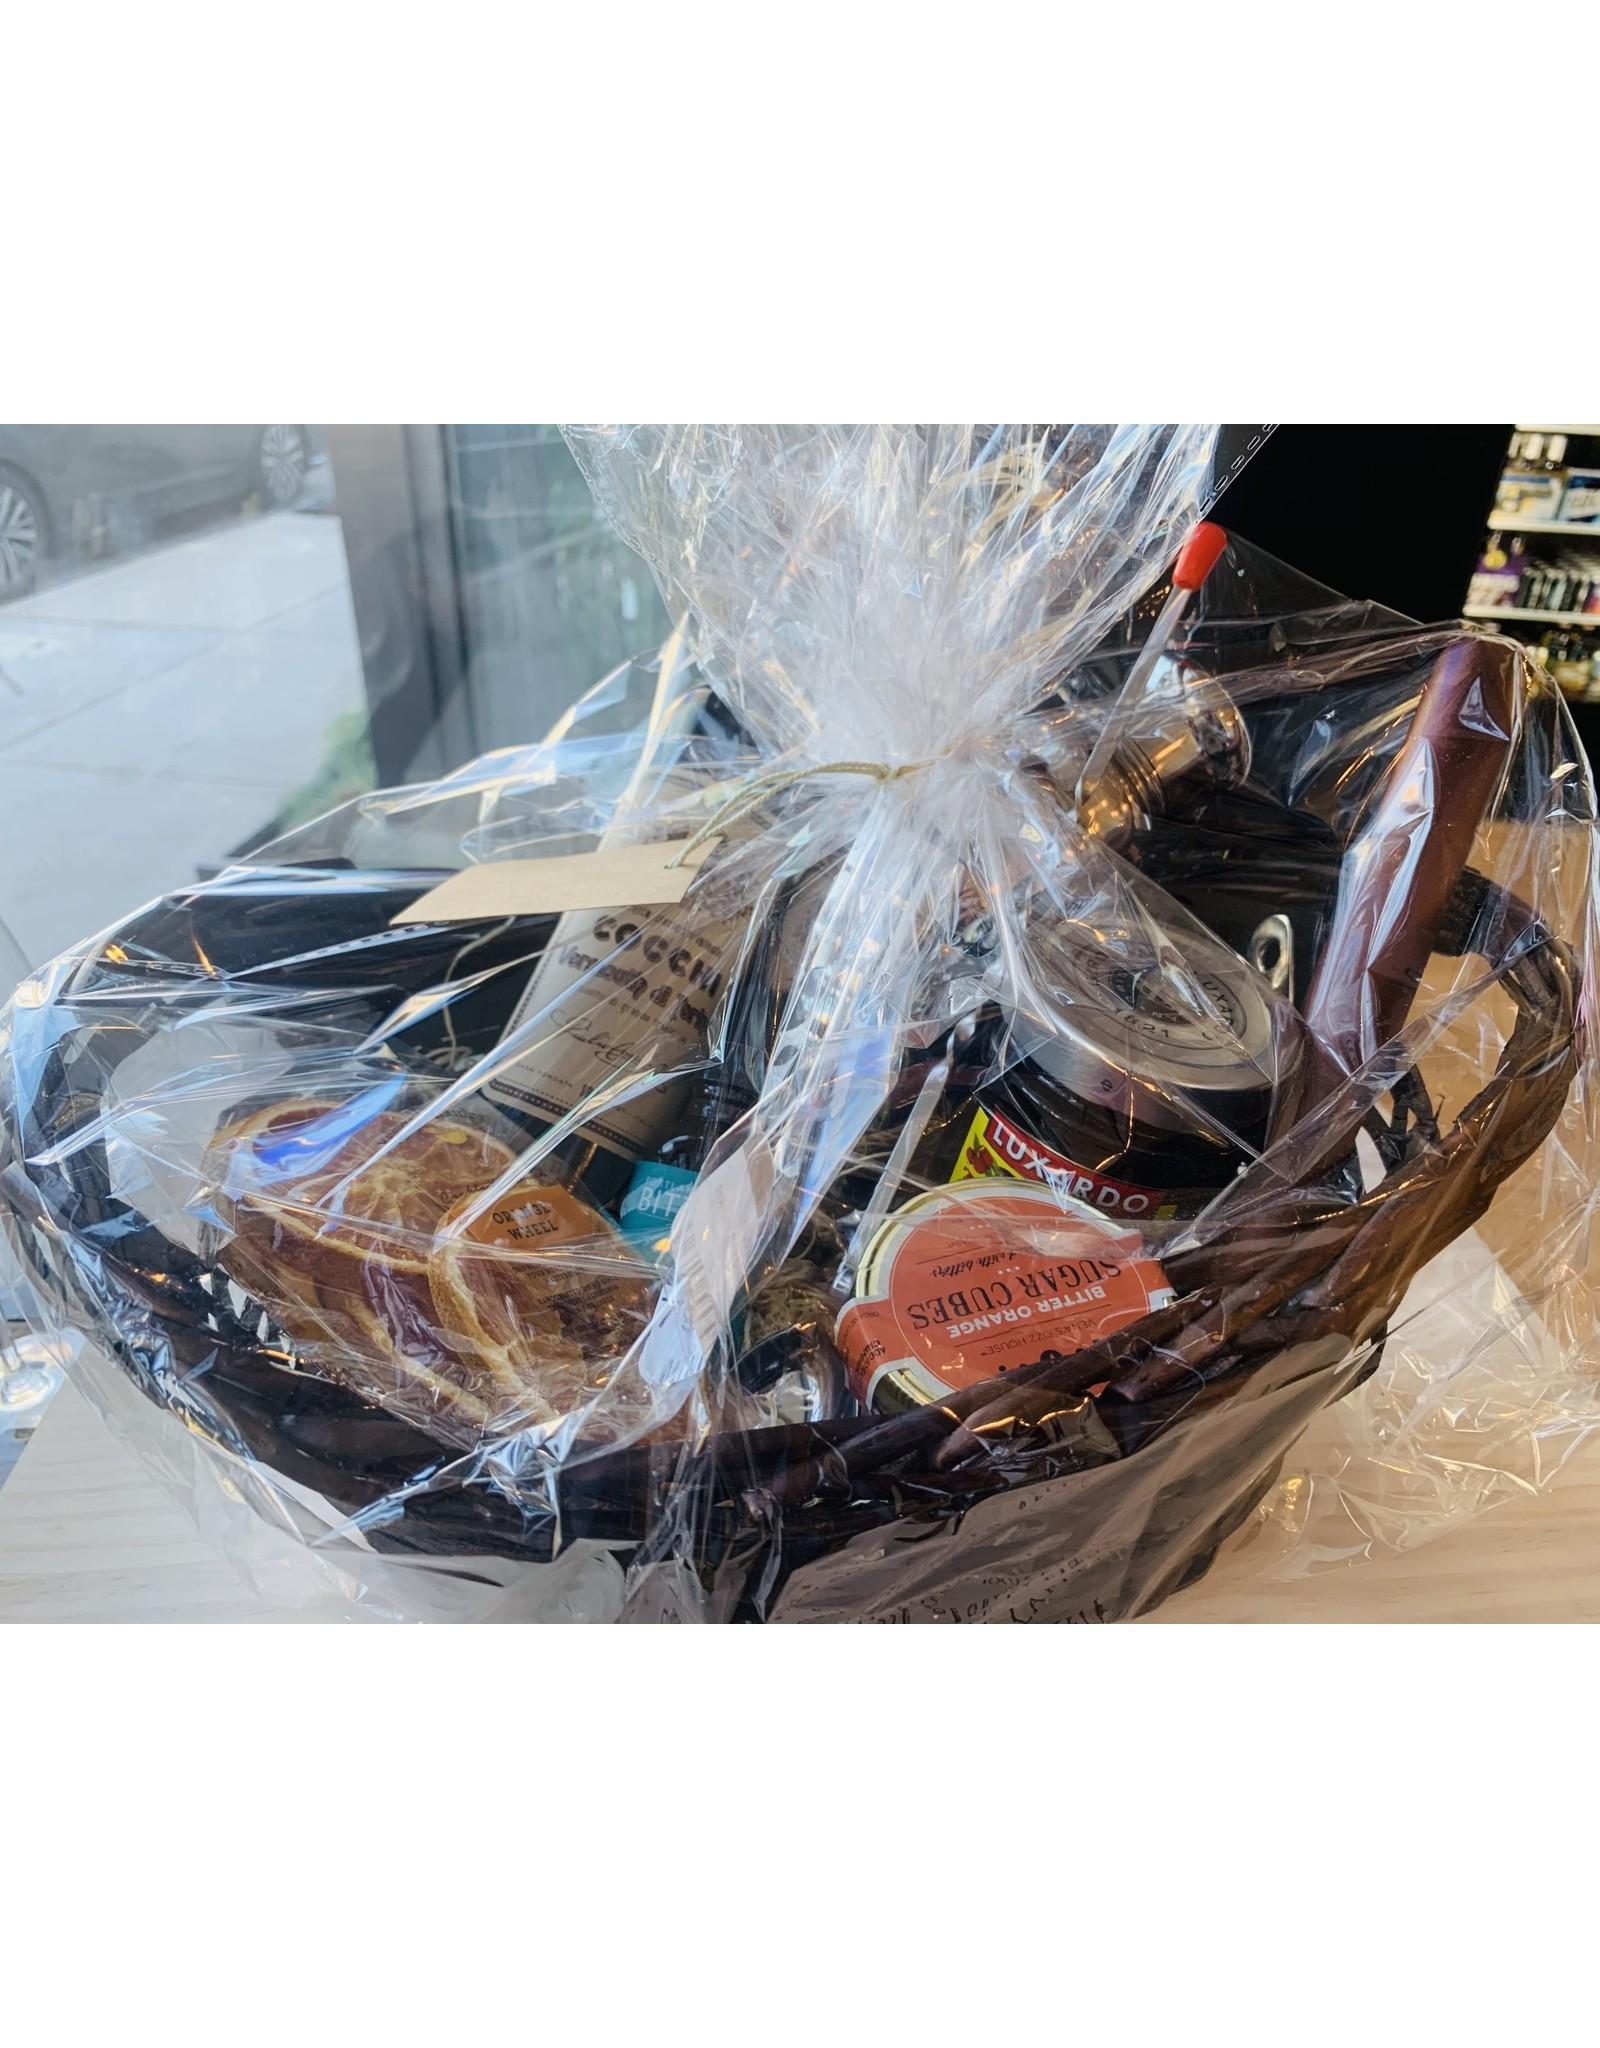 BottleHouse Manhattan/Old Fashioned Gift Basket